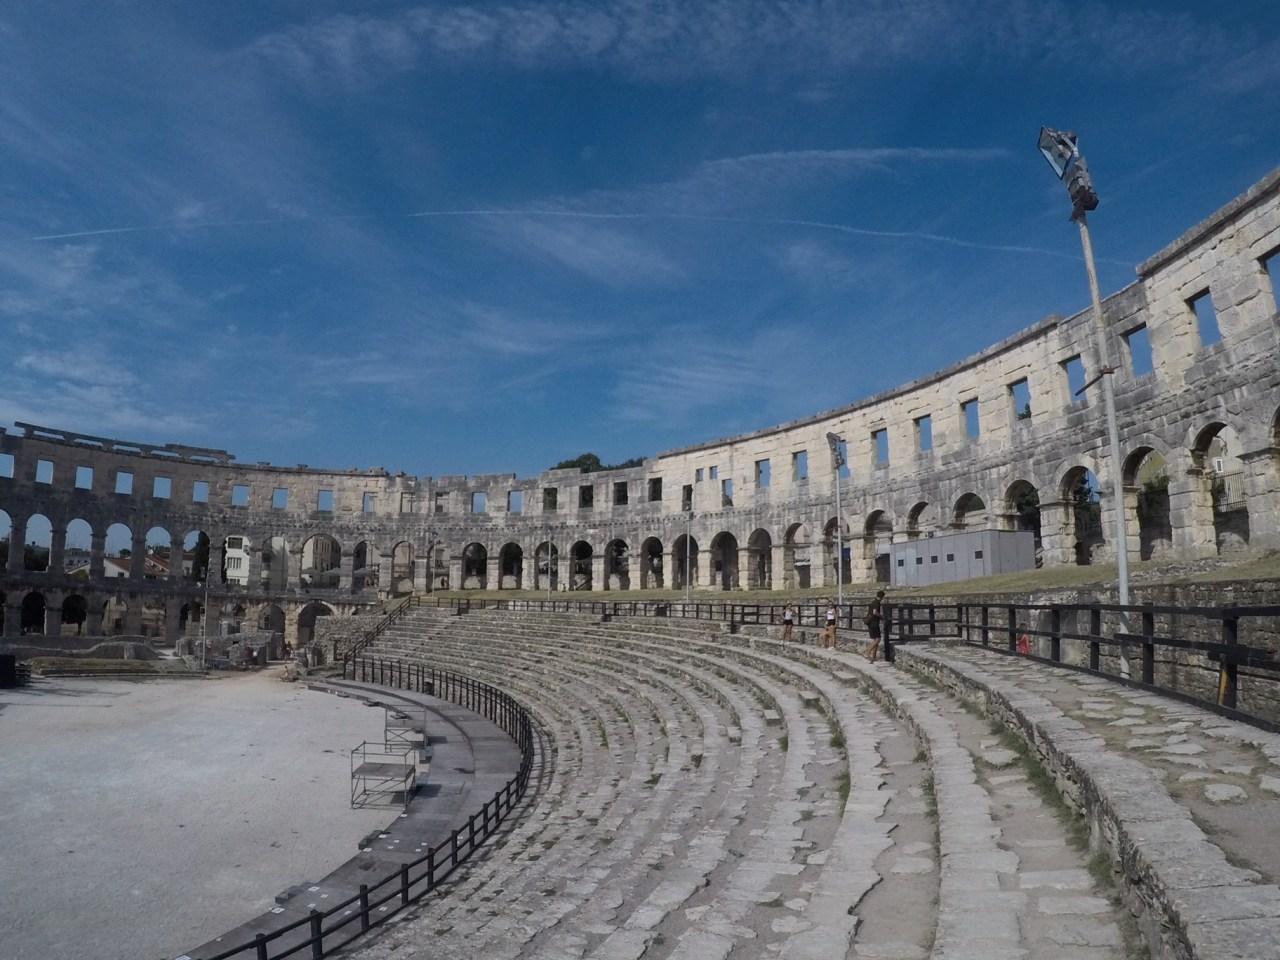 Inside the Pula Colosseum